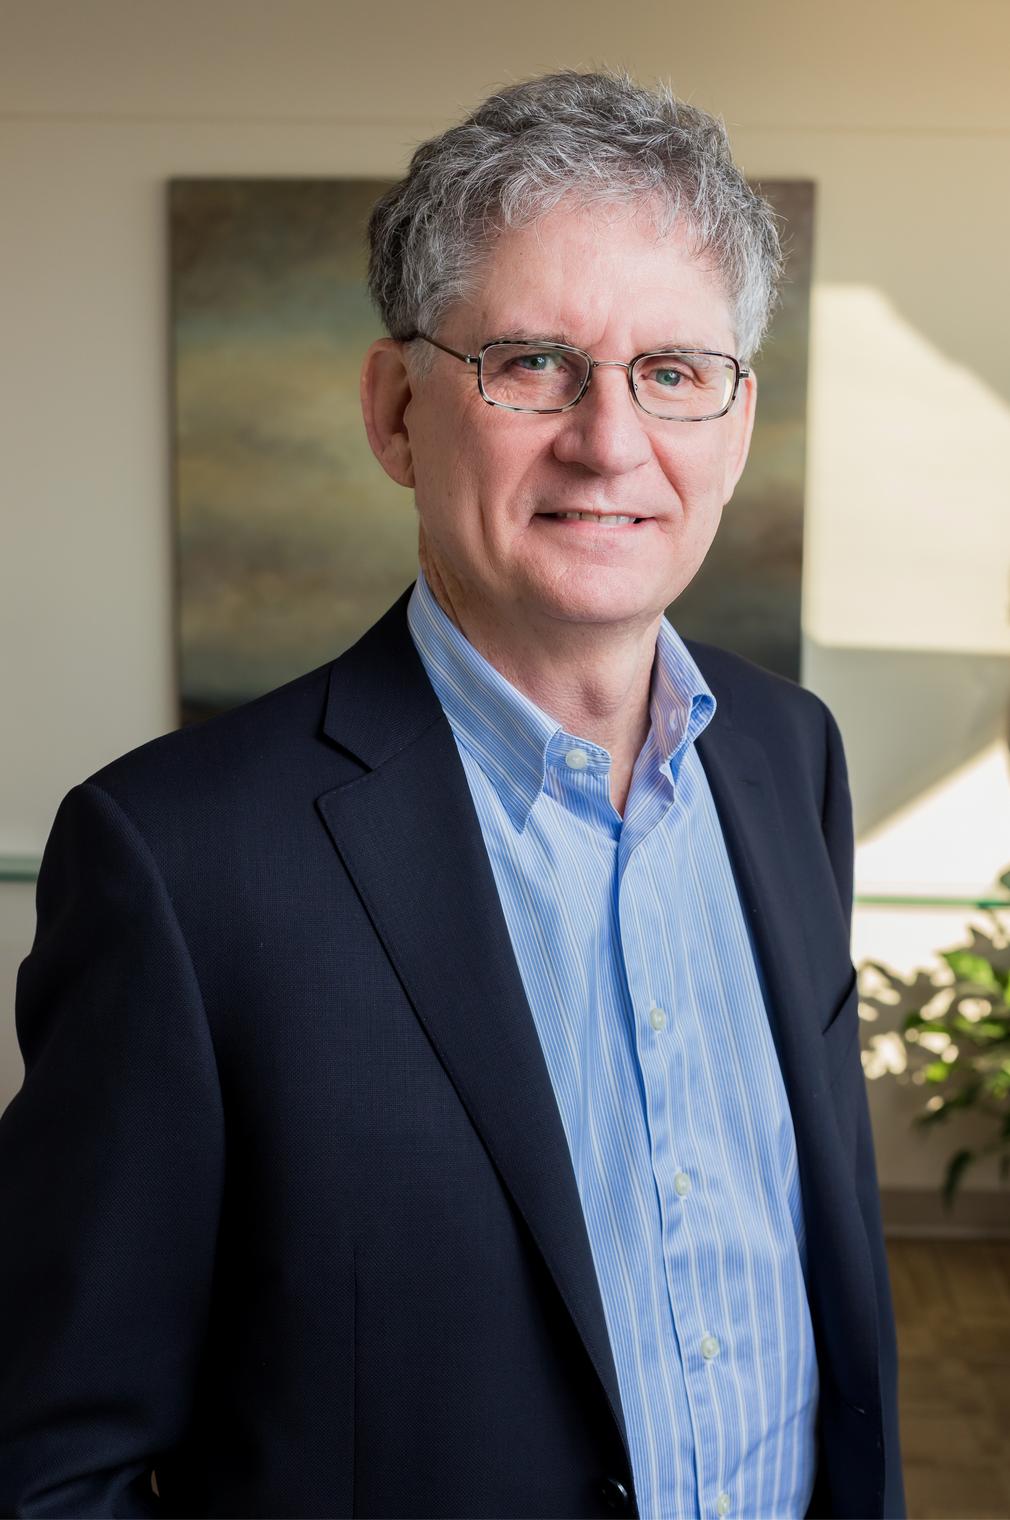 William C. Dudley - Industry Lead